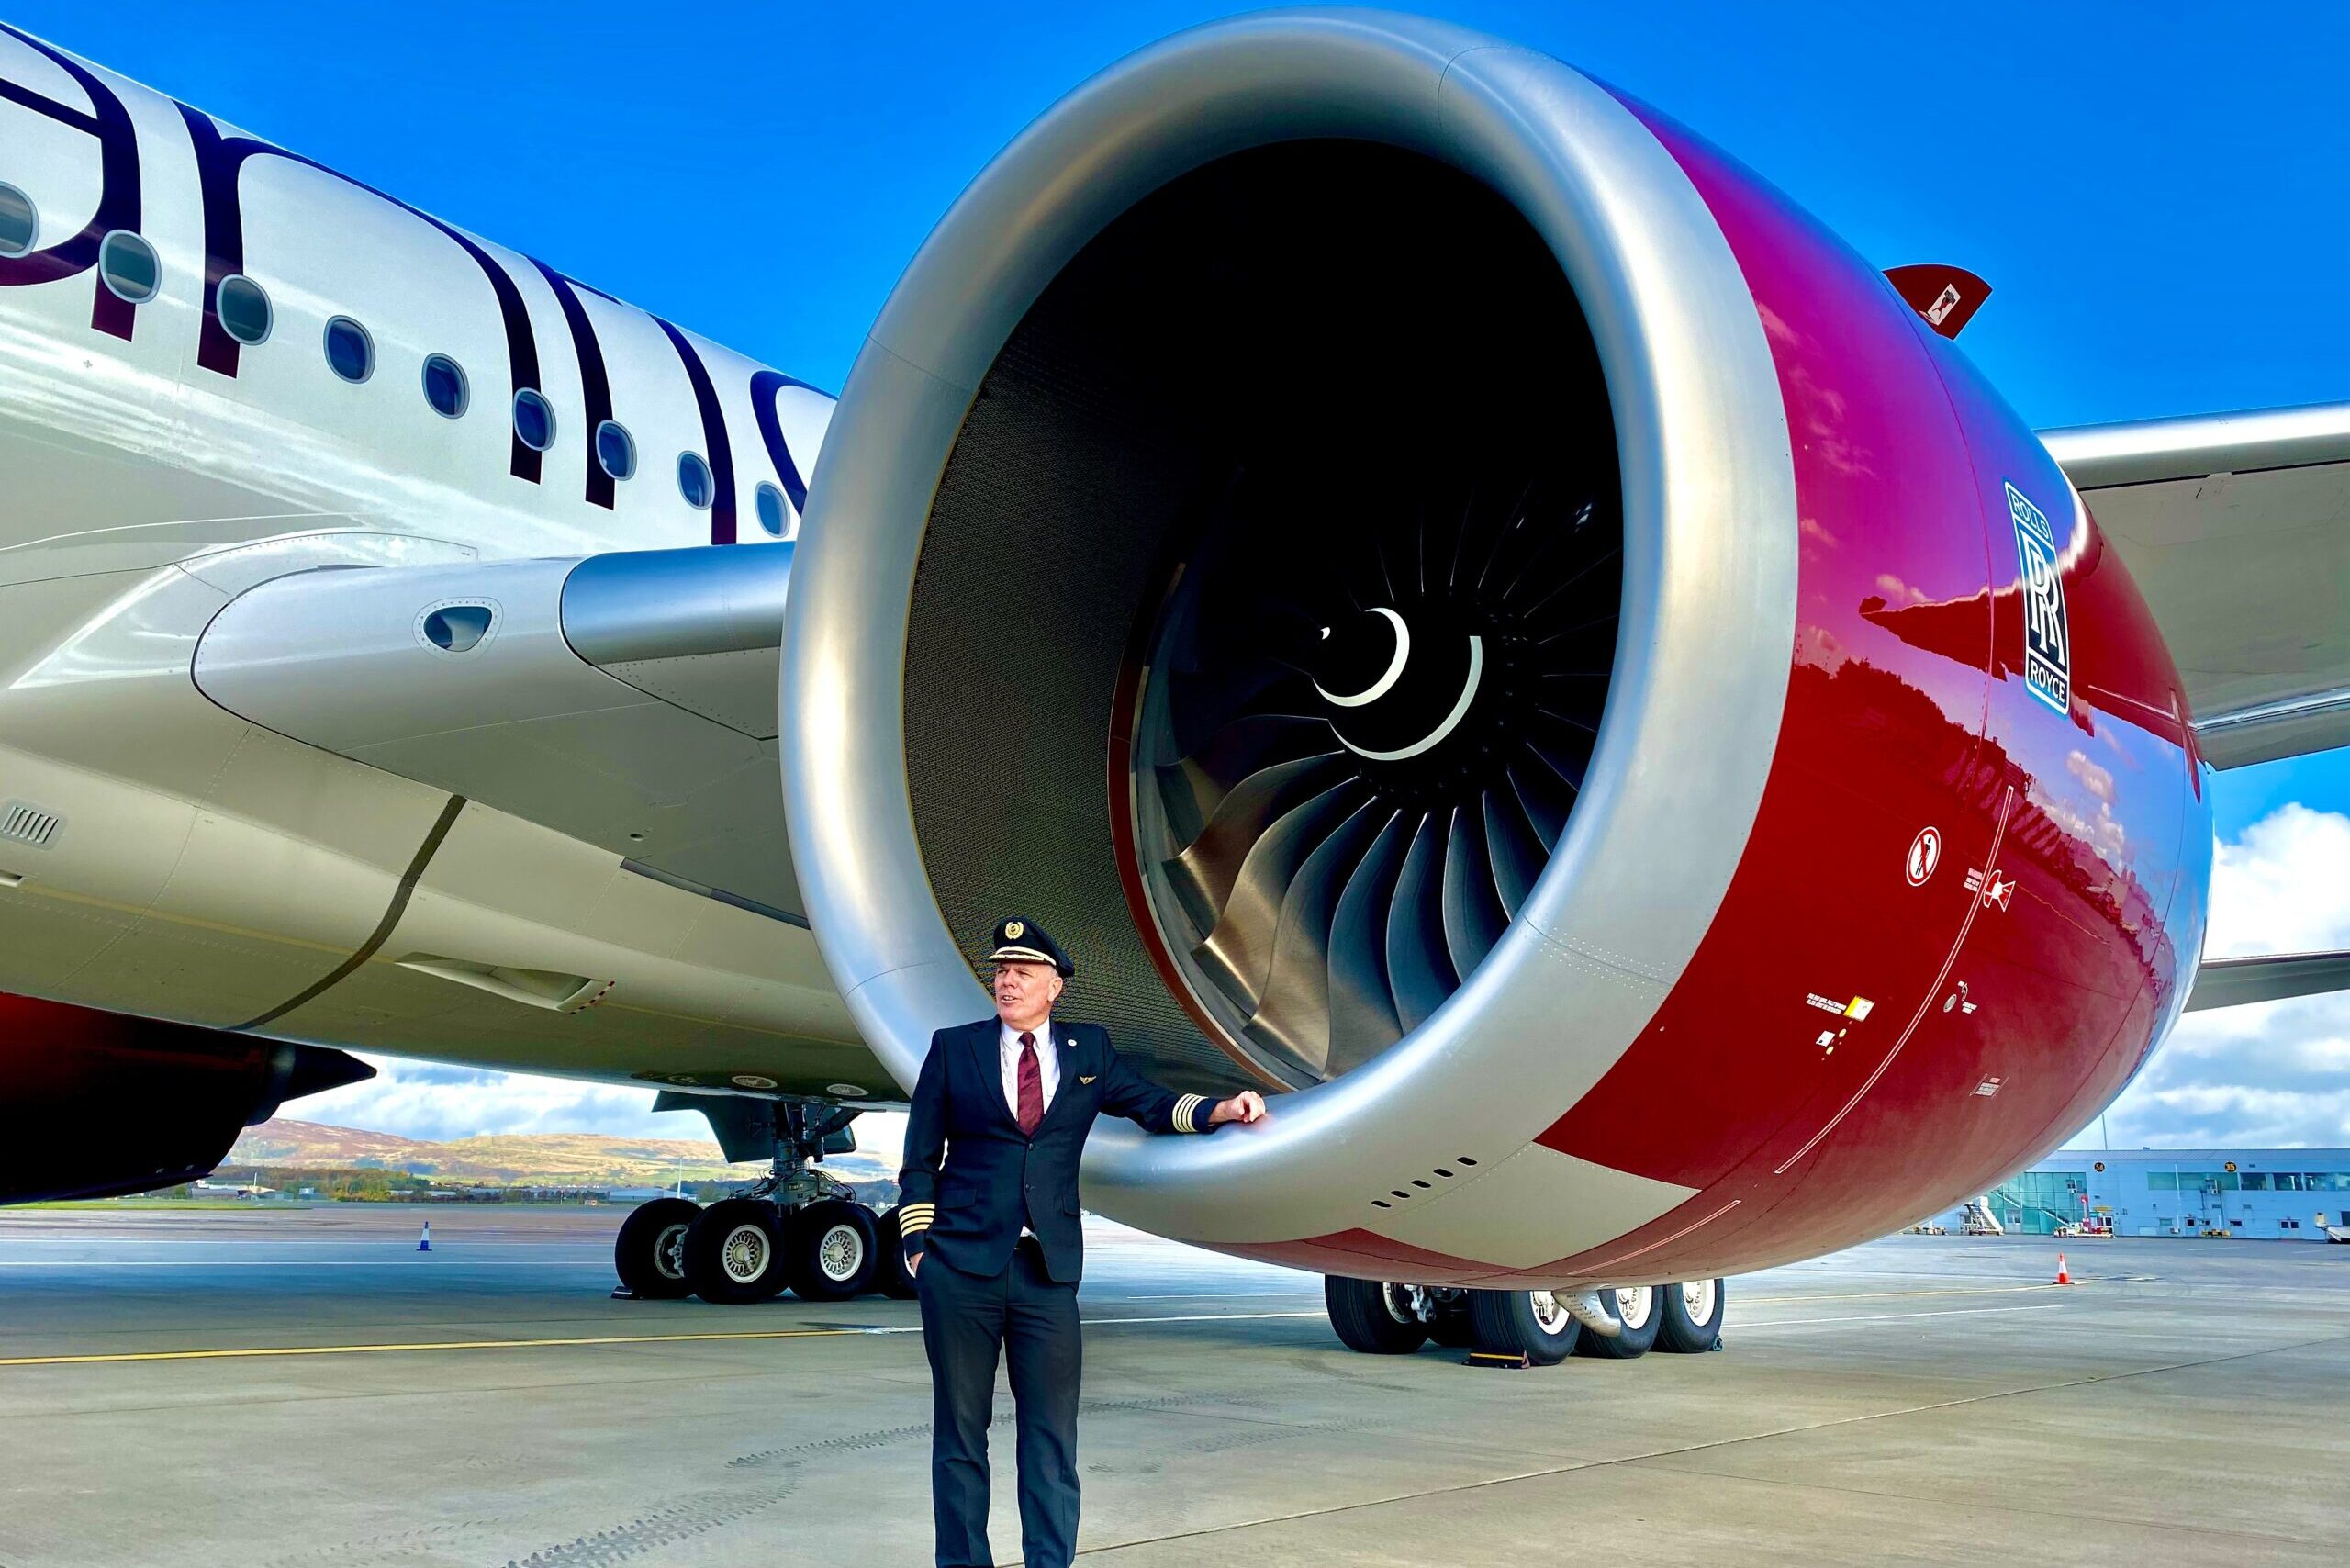 Captain Chris, Virgin Atlantic, Airbus A350 Pilot